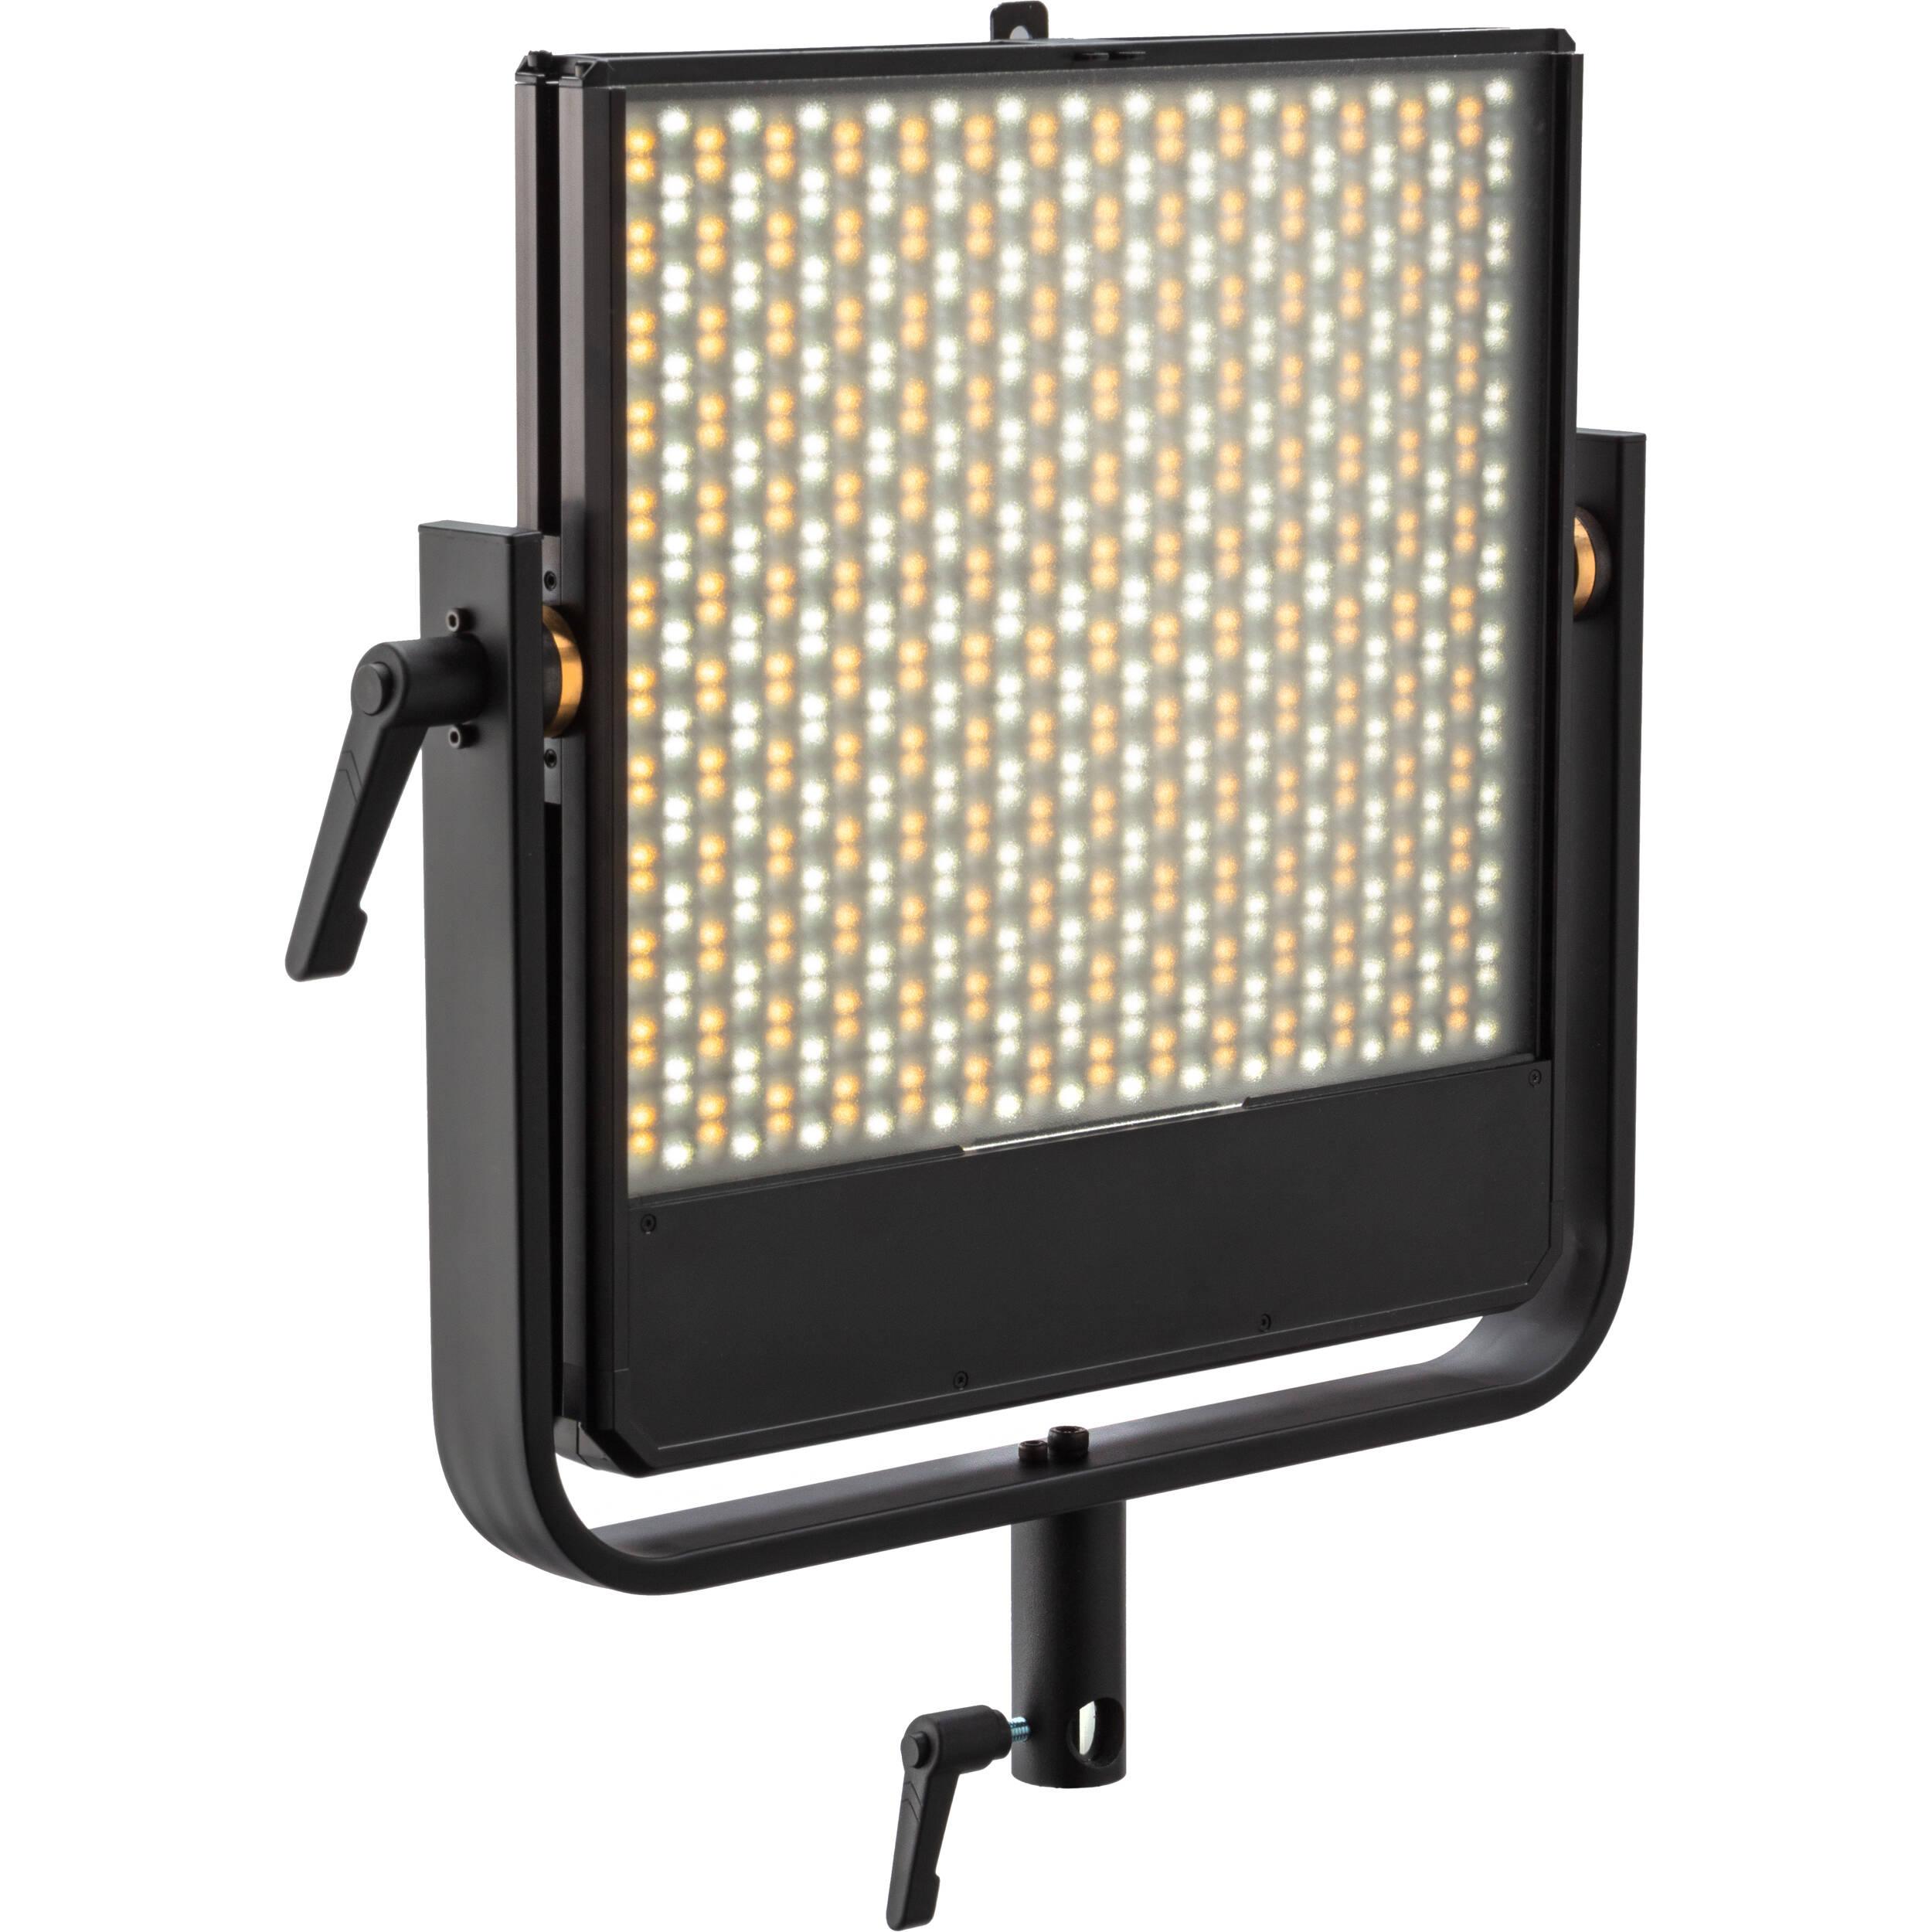 Luxli Timpani 1x1 Rgbaw Led Light Bh Photo Video Rgb Circuits Reviews Online Shopping On